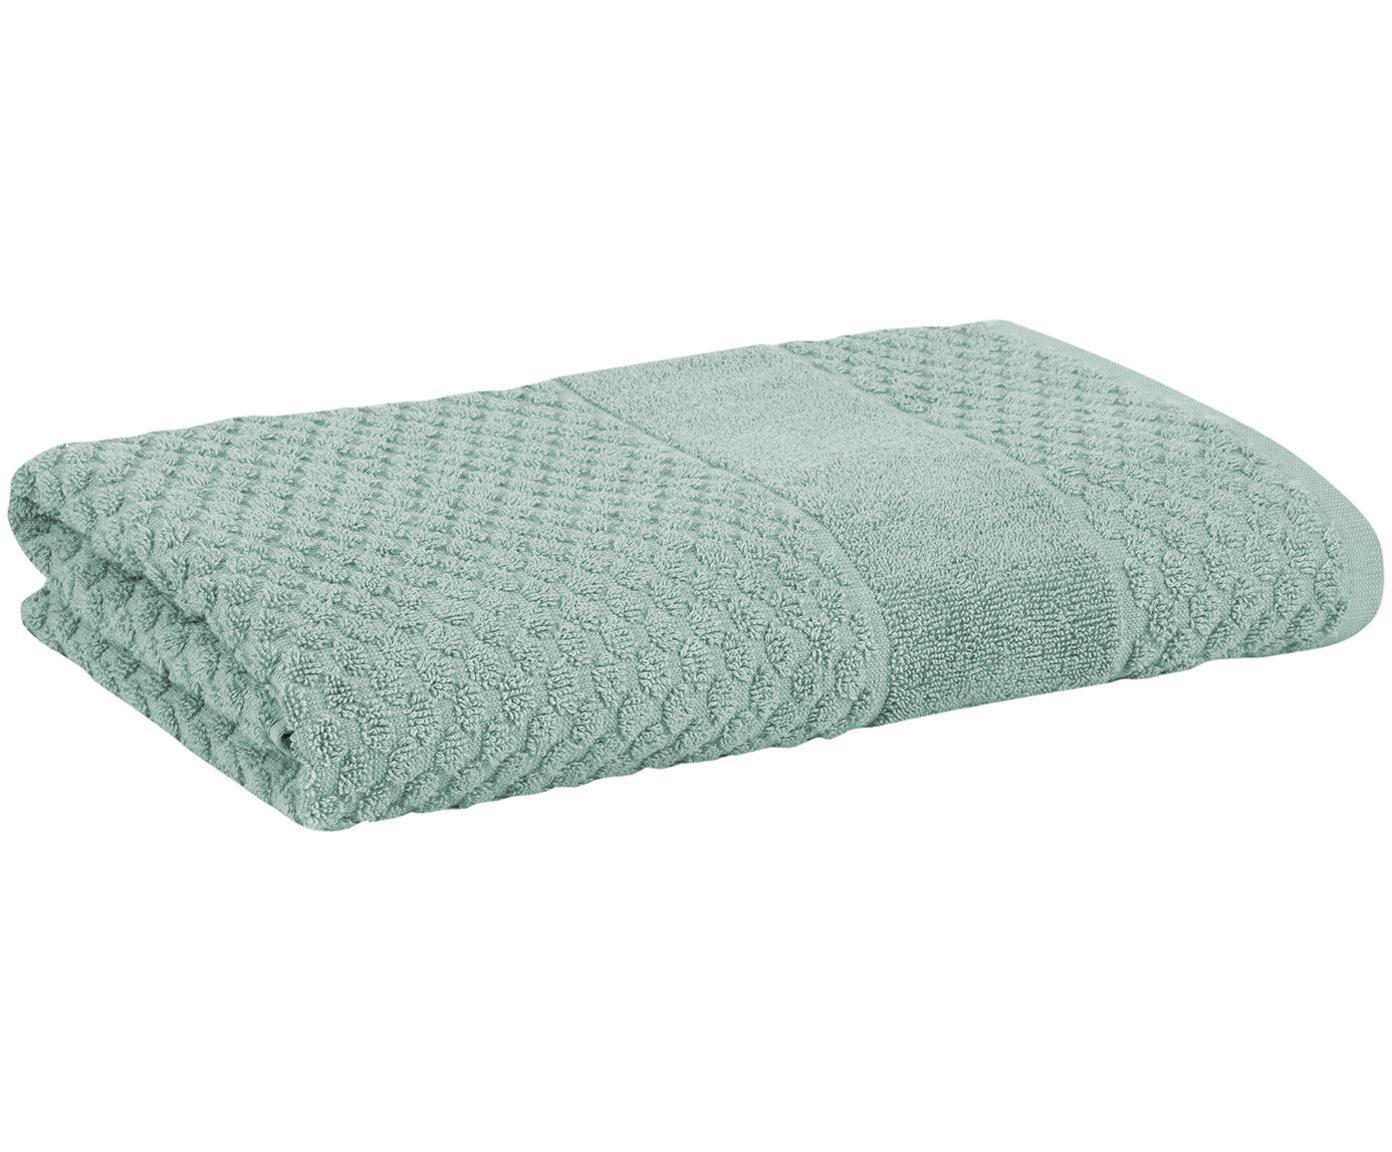 Handdoek Katharina, 100% katoen, middelzware kwaliteit 500 g/m², Groen, Handdoek